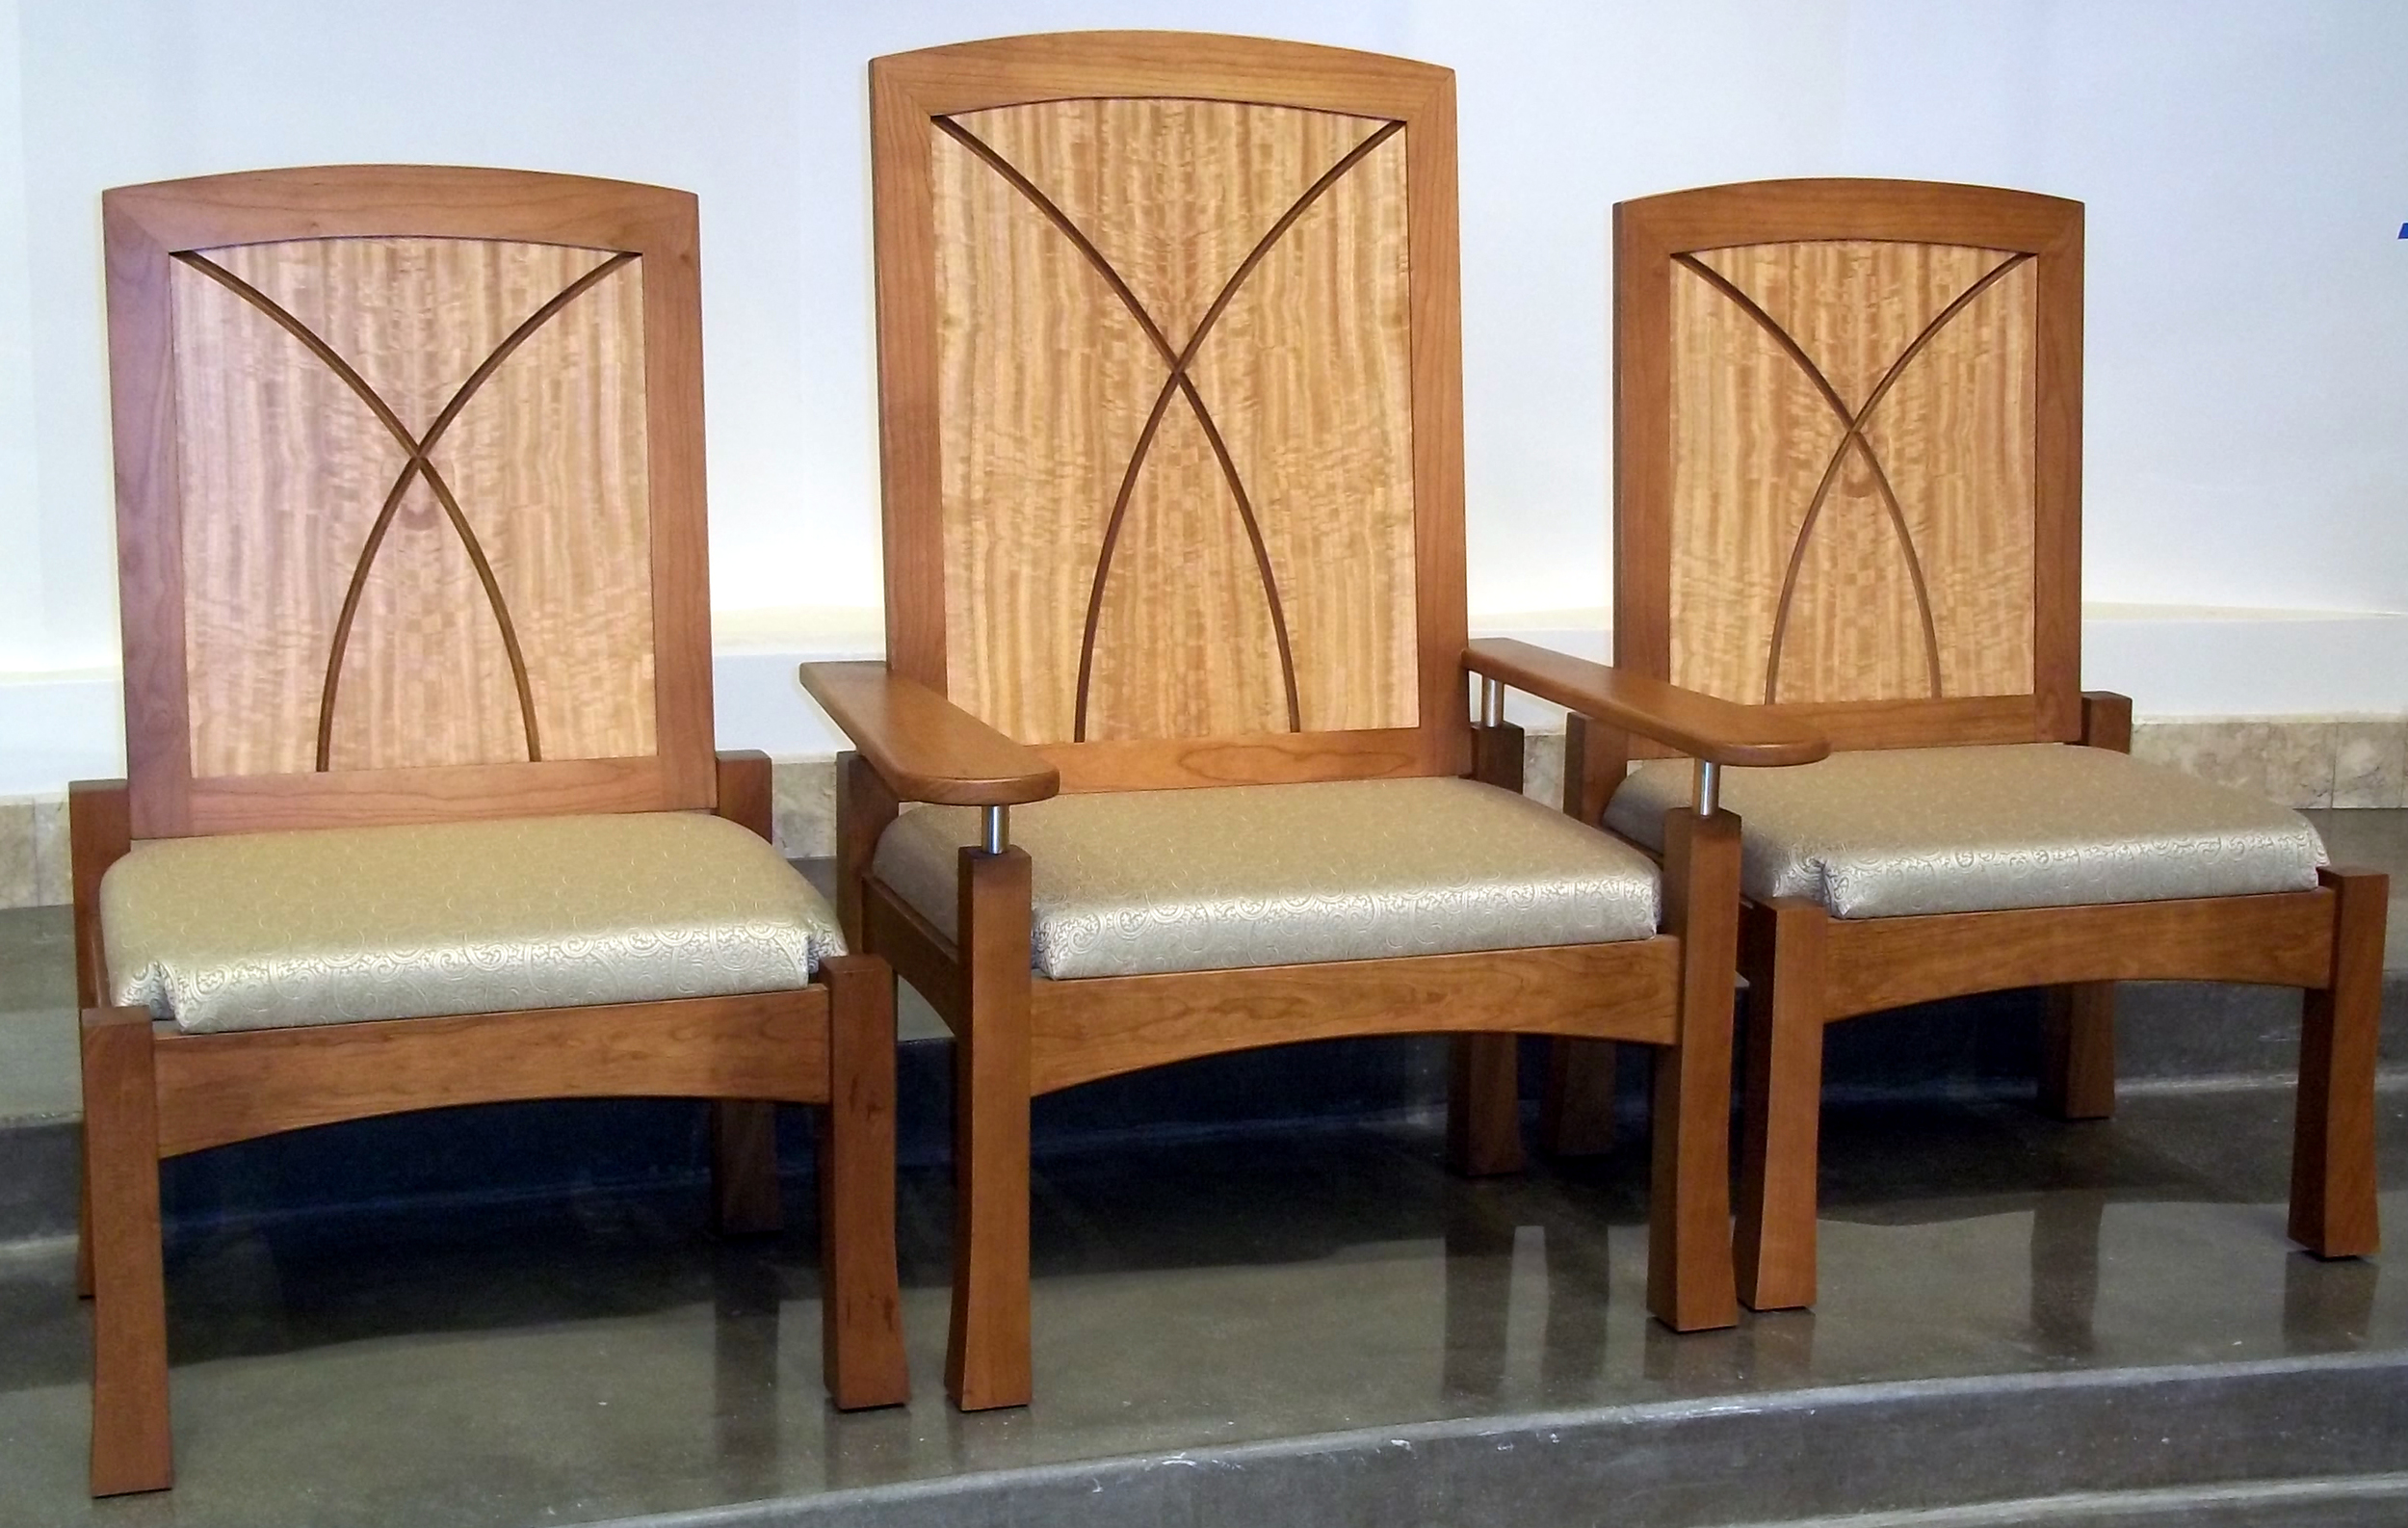 OLQA Chairs 1.jpg